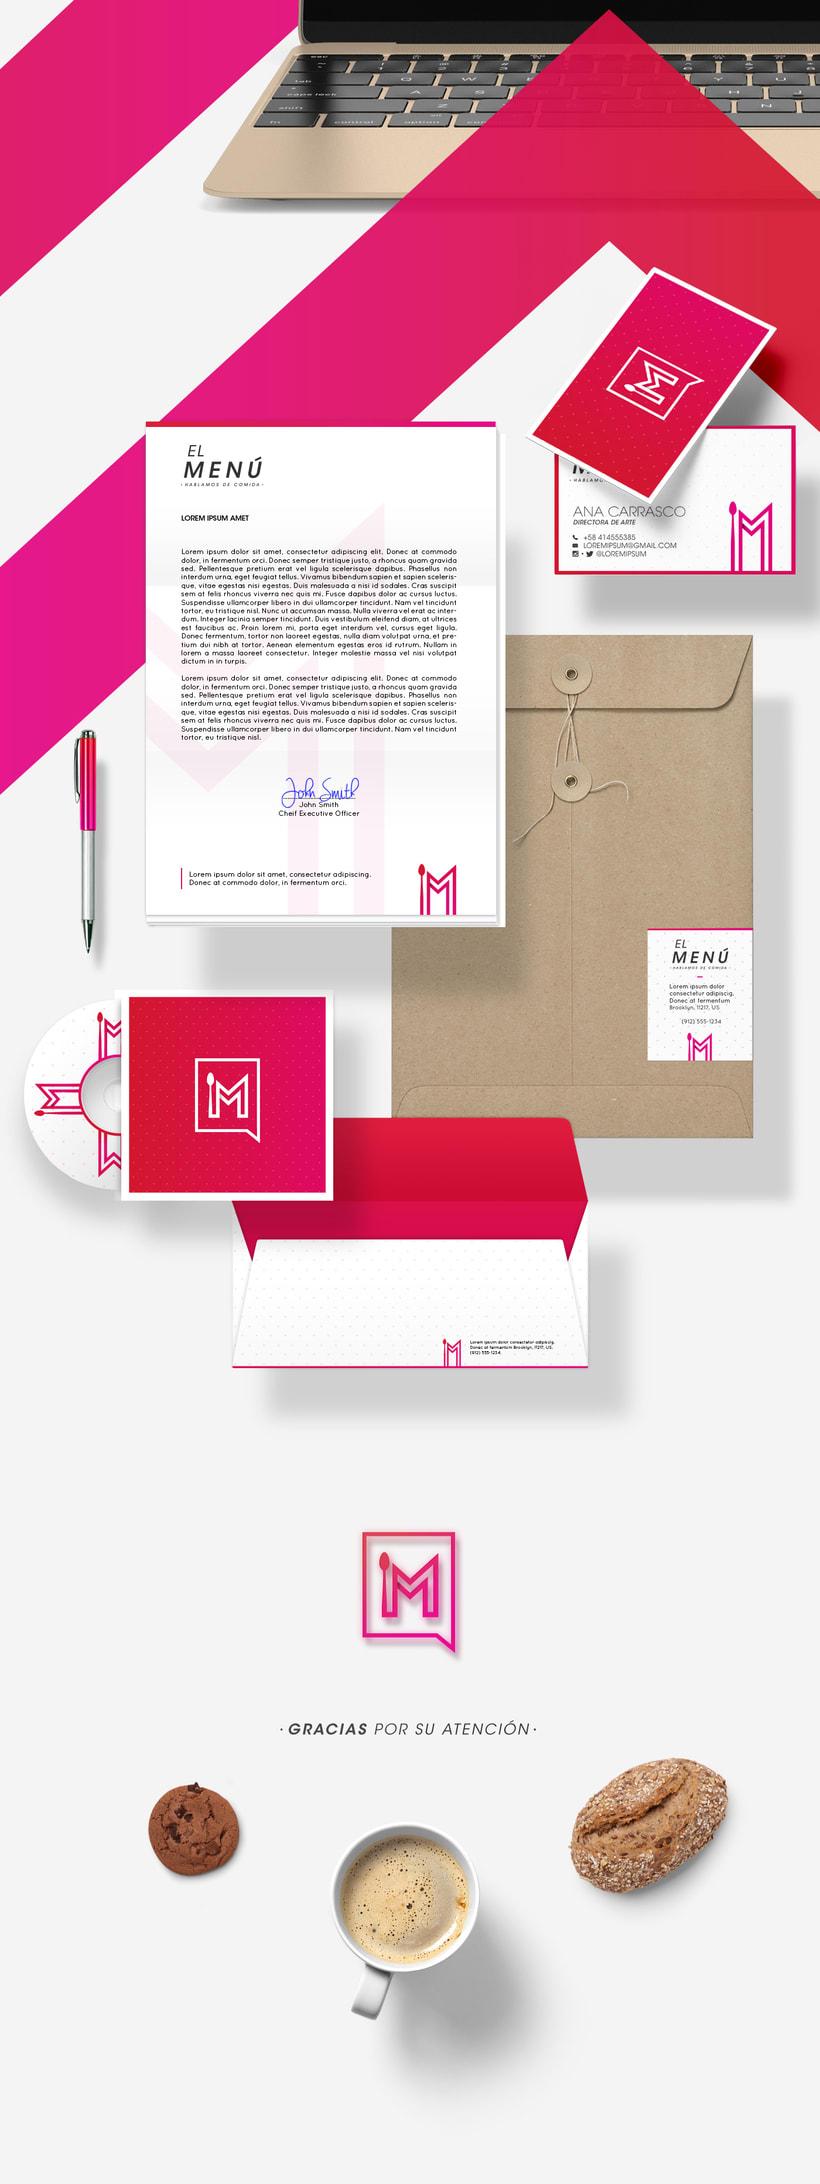 Branding - El Menú 3